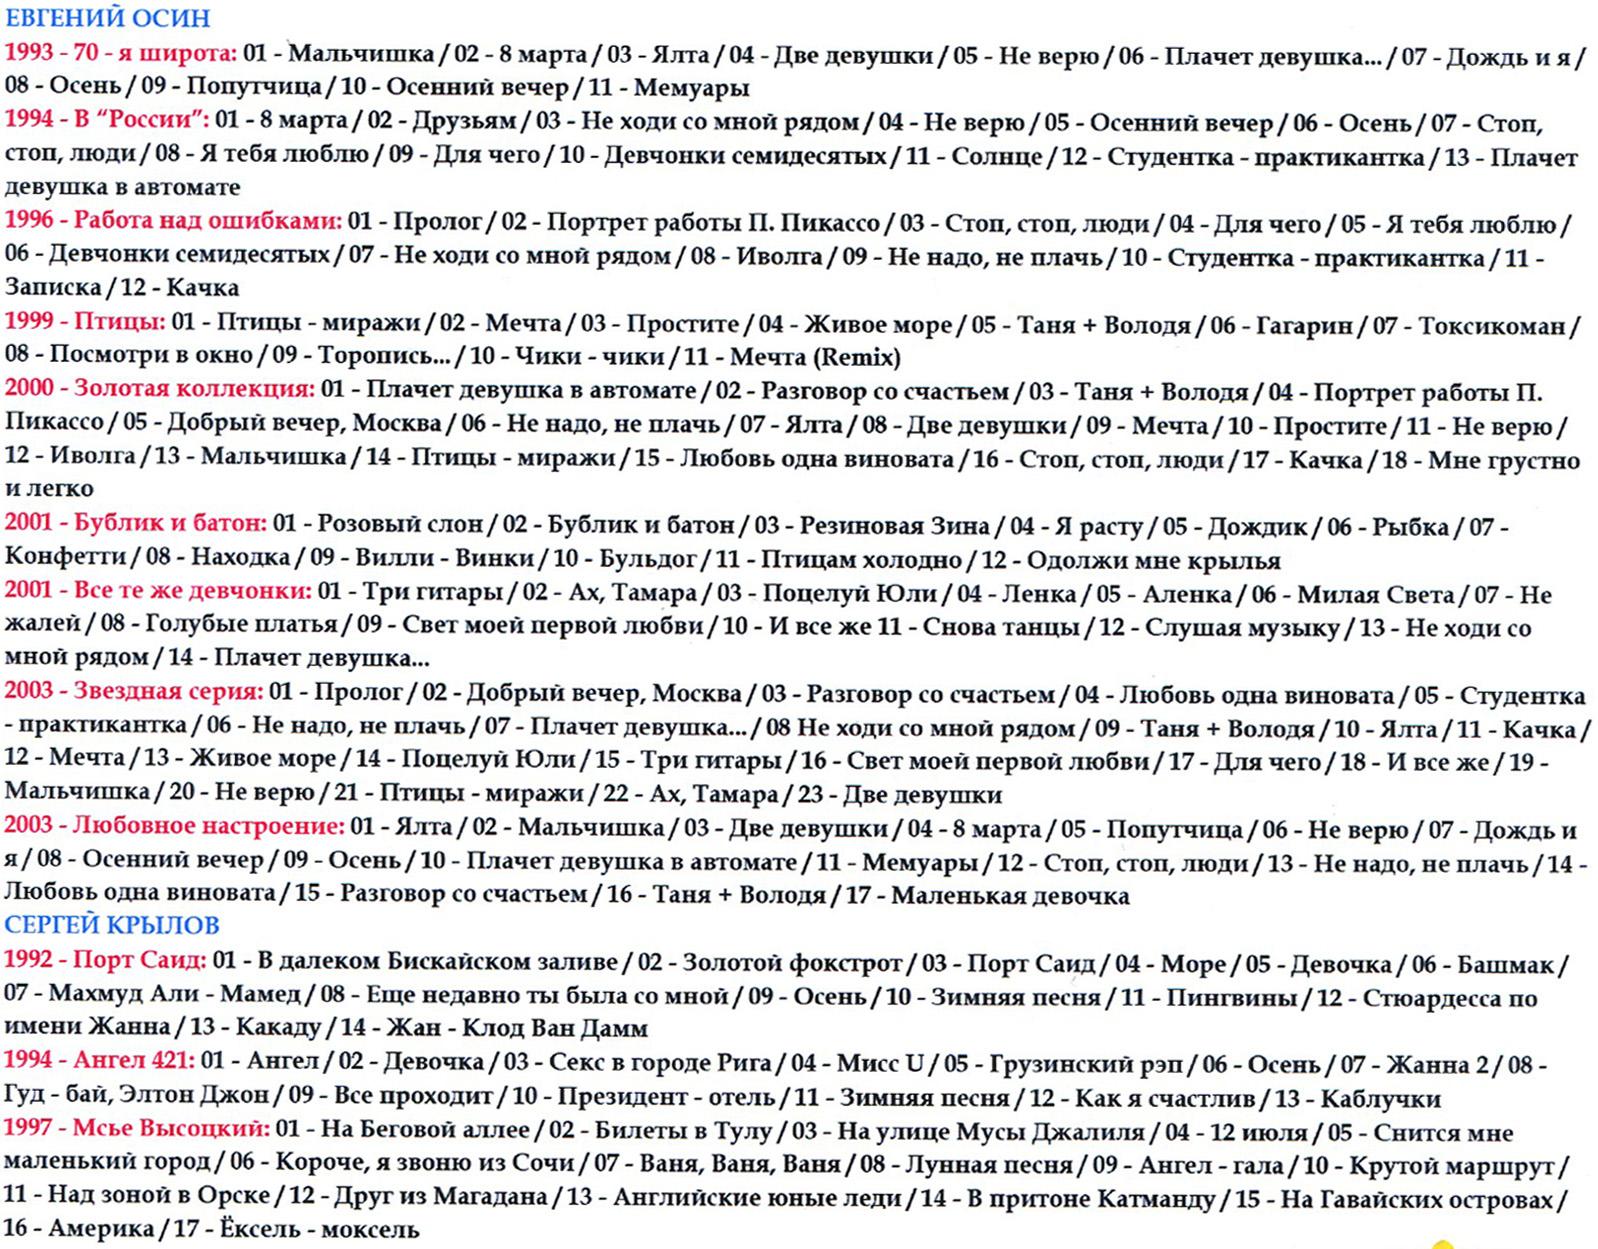 Евгений Осин  & Сергей Крылов [mp3]